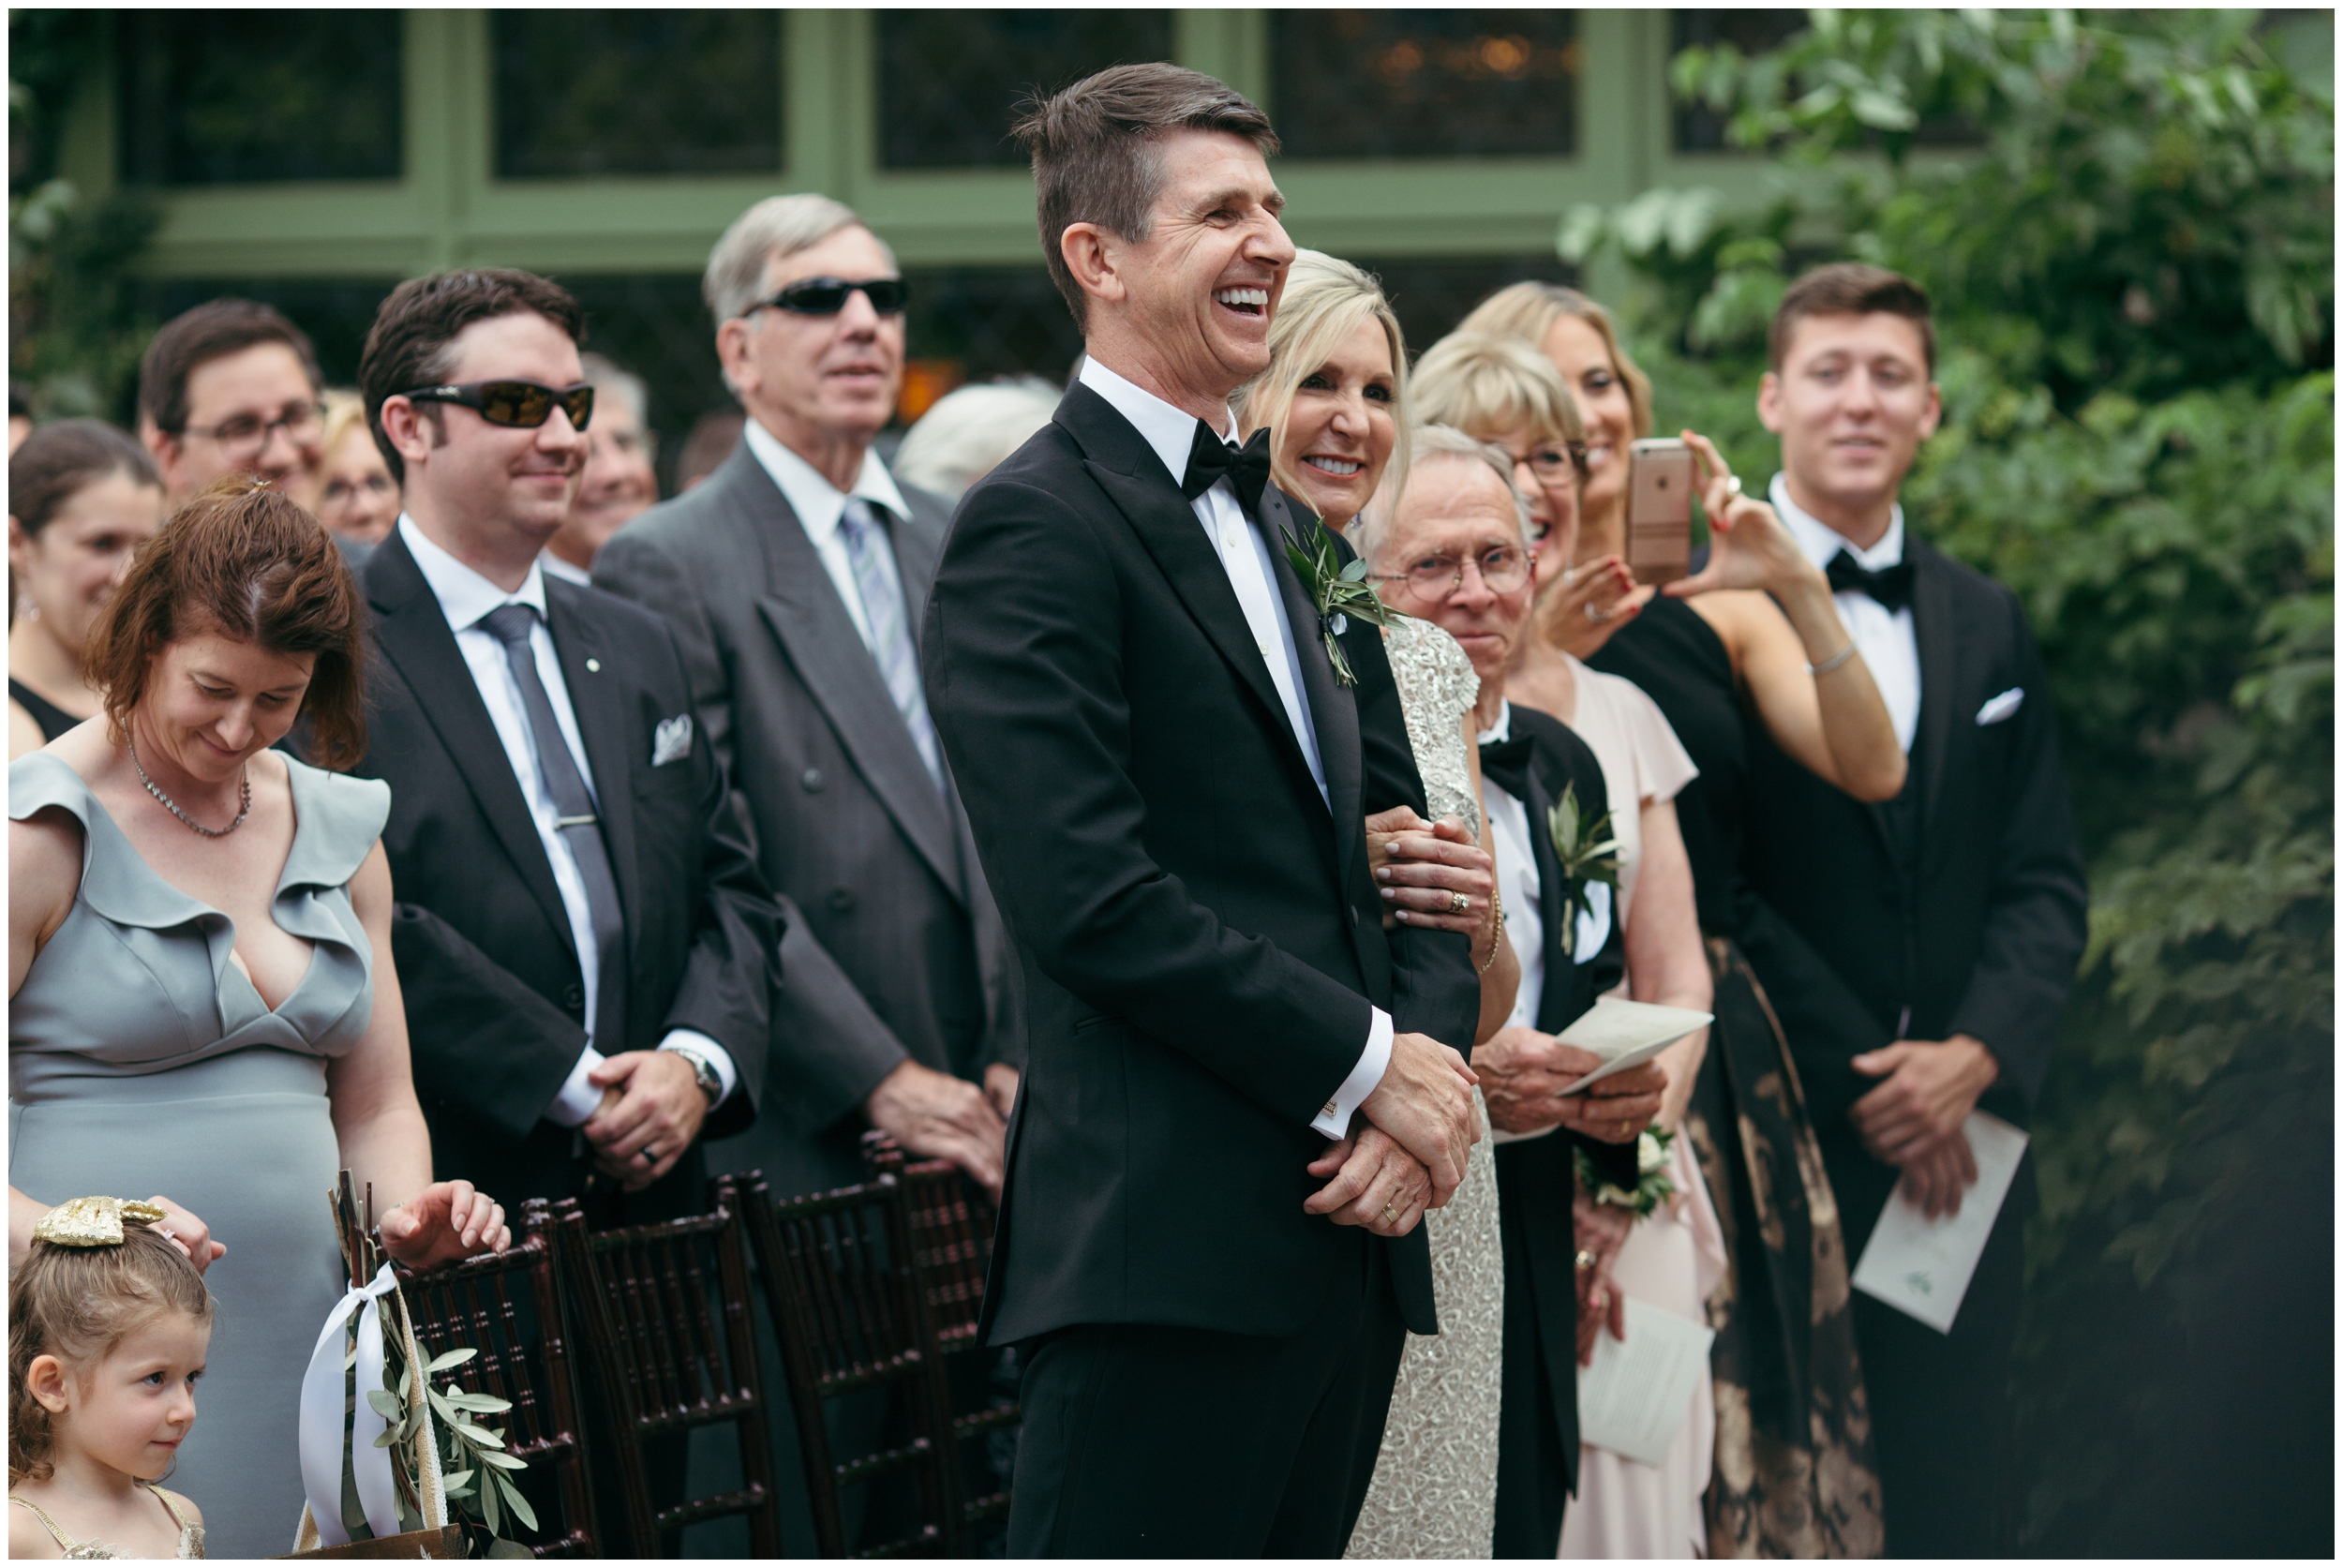 Willowdale-Estate-Wedding-Bailey-Q-Photo-Boston-Wedding-Photographer-032.JPG